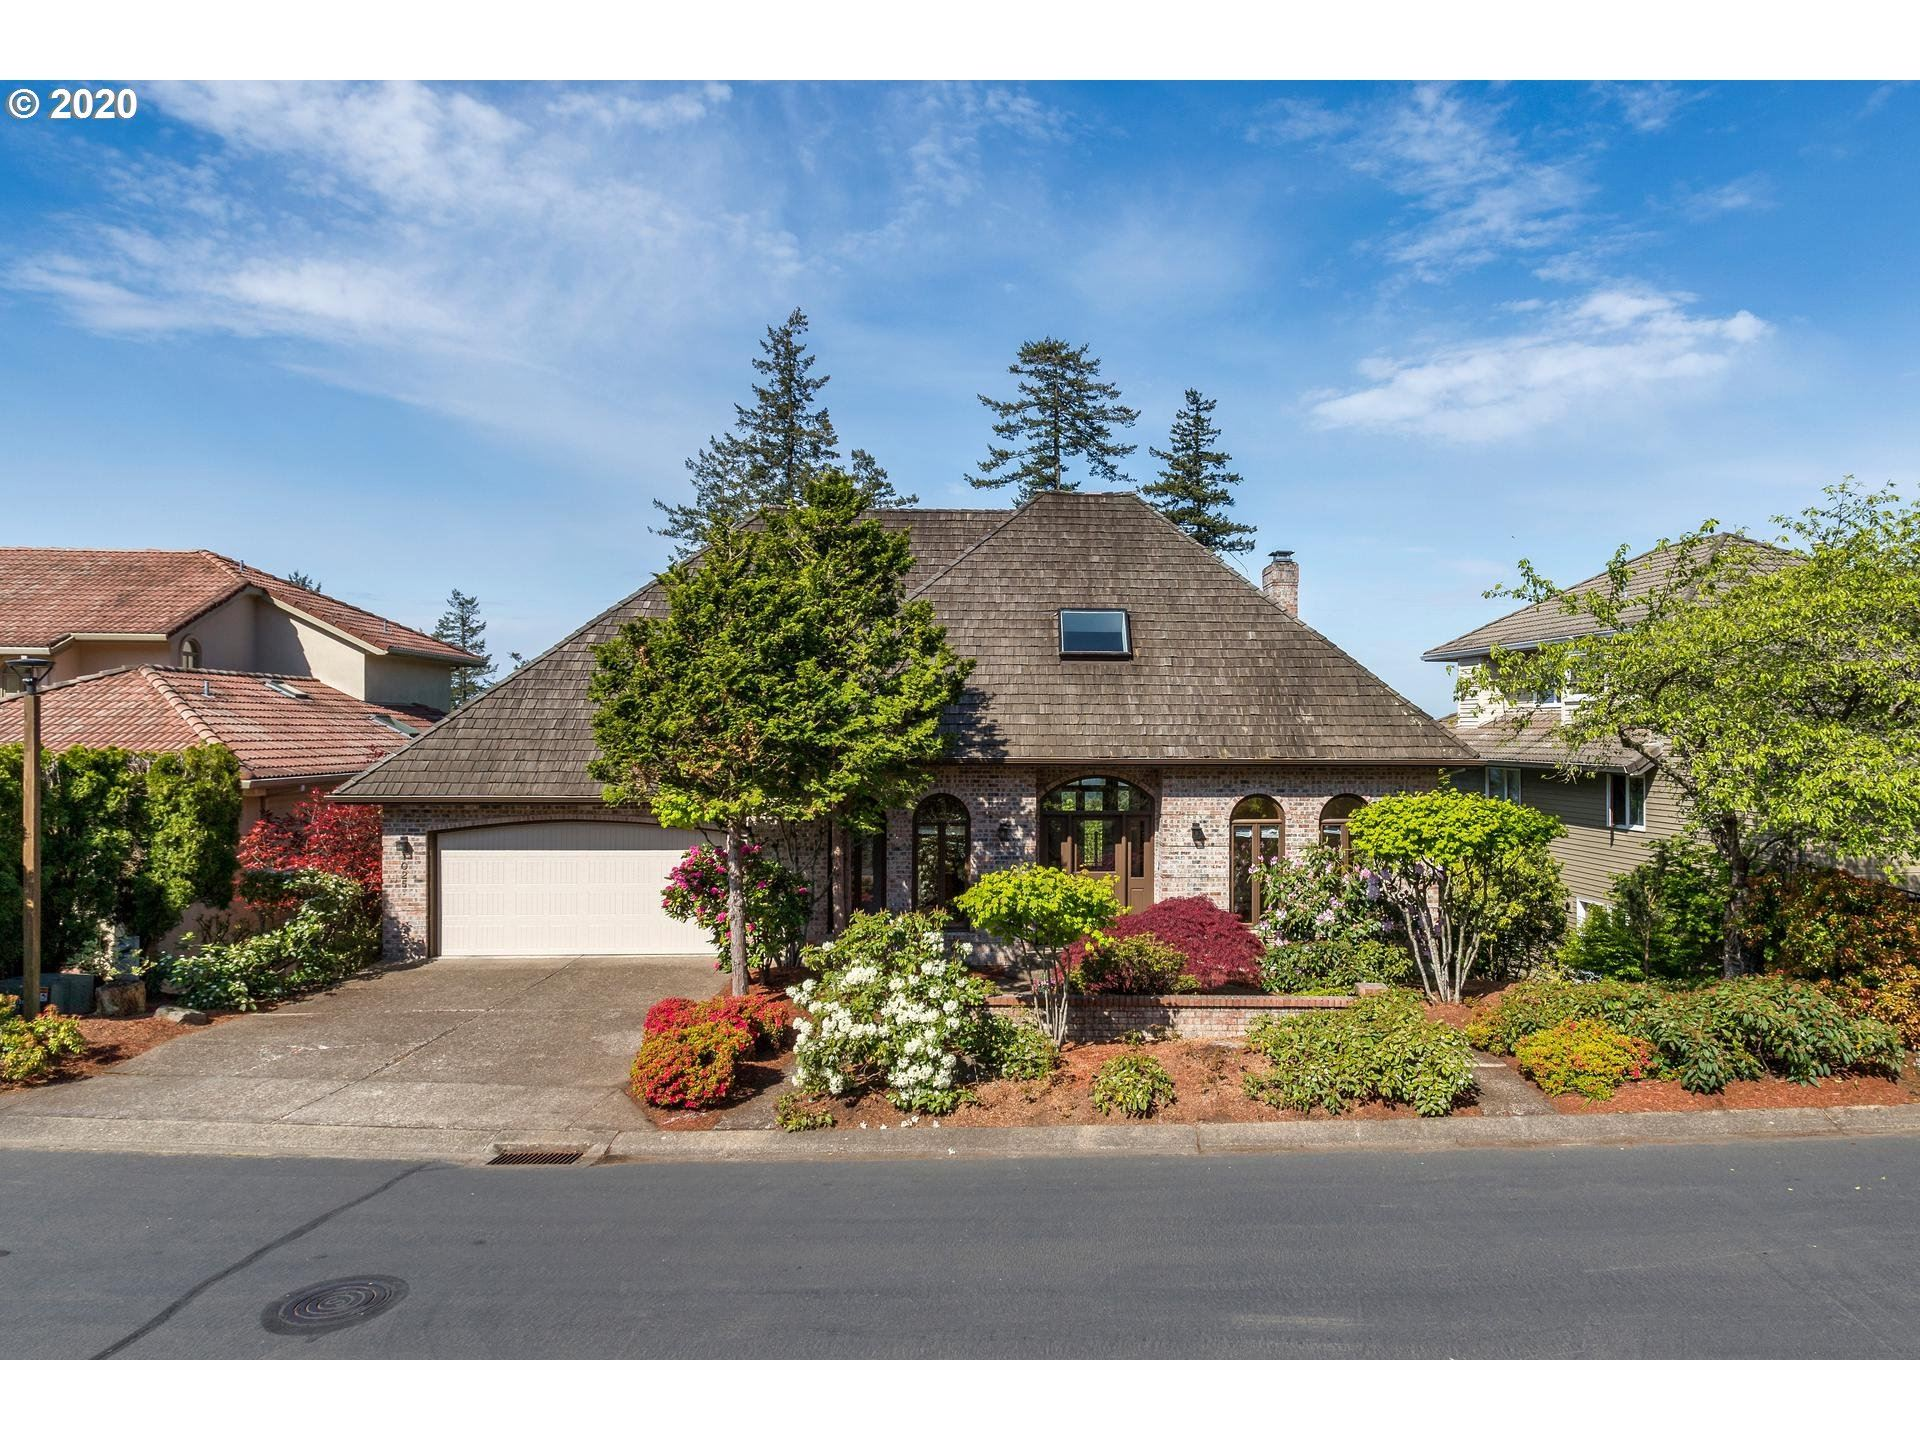 1025 SW SUMMIT VIEW DR, Portland, OR 97225 - MLS#: 19642254